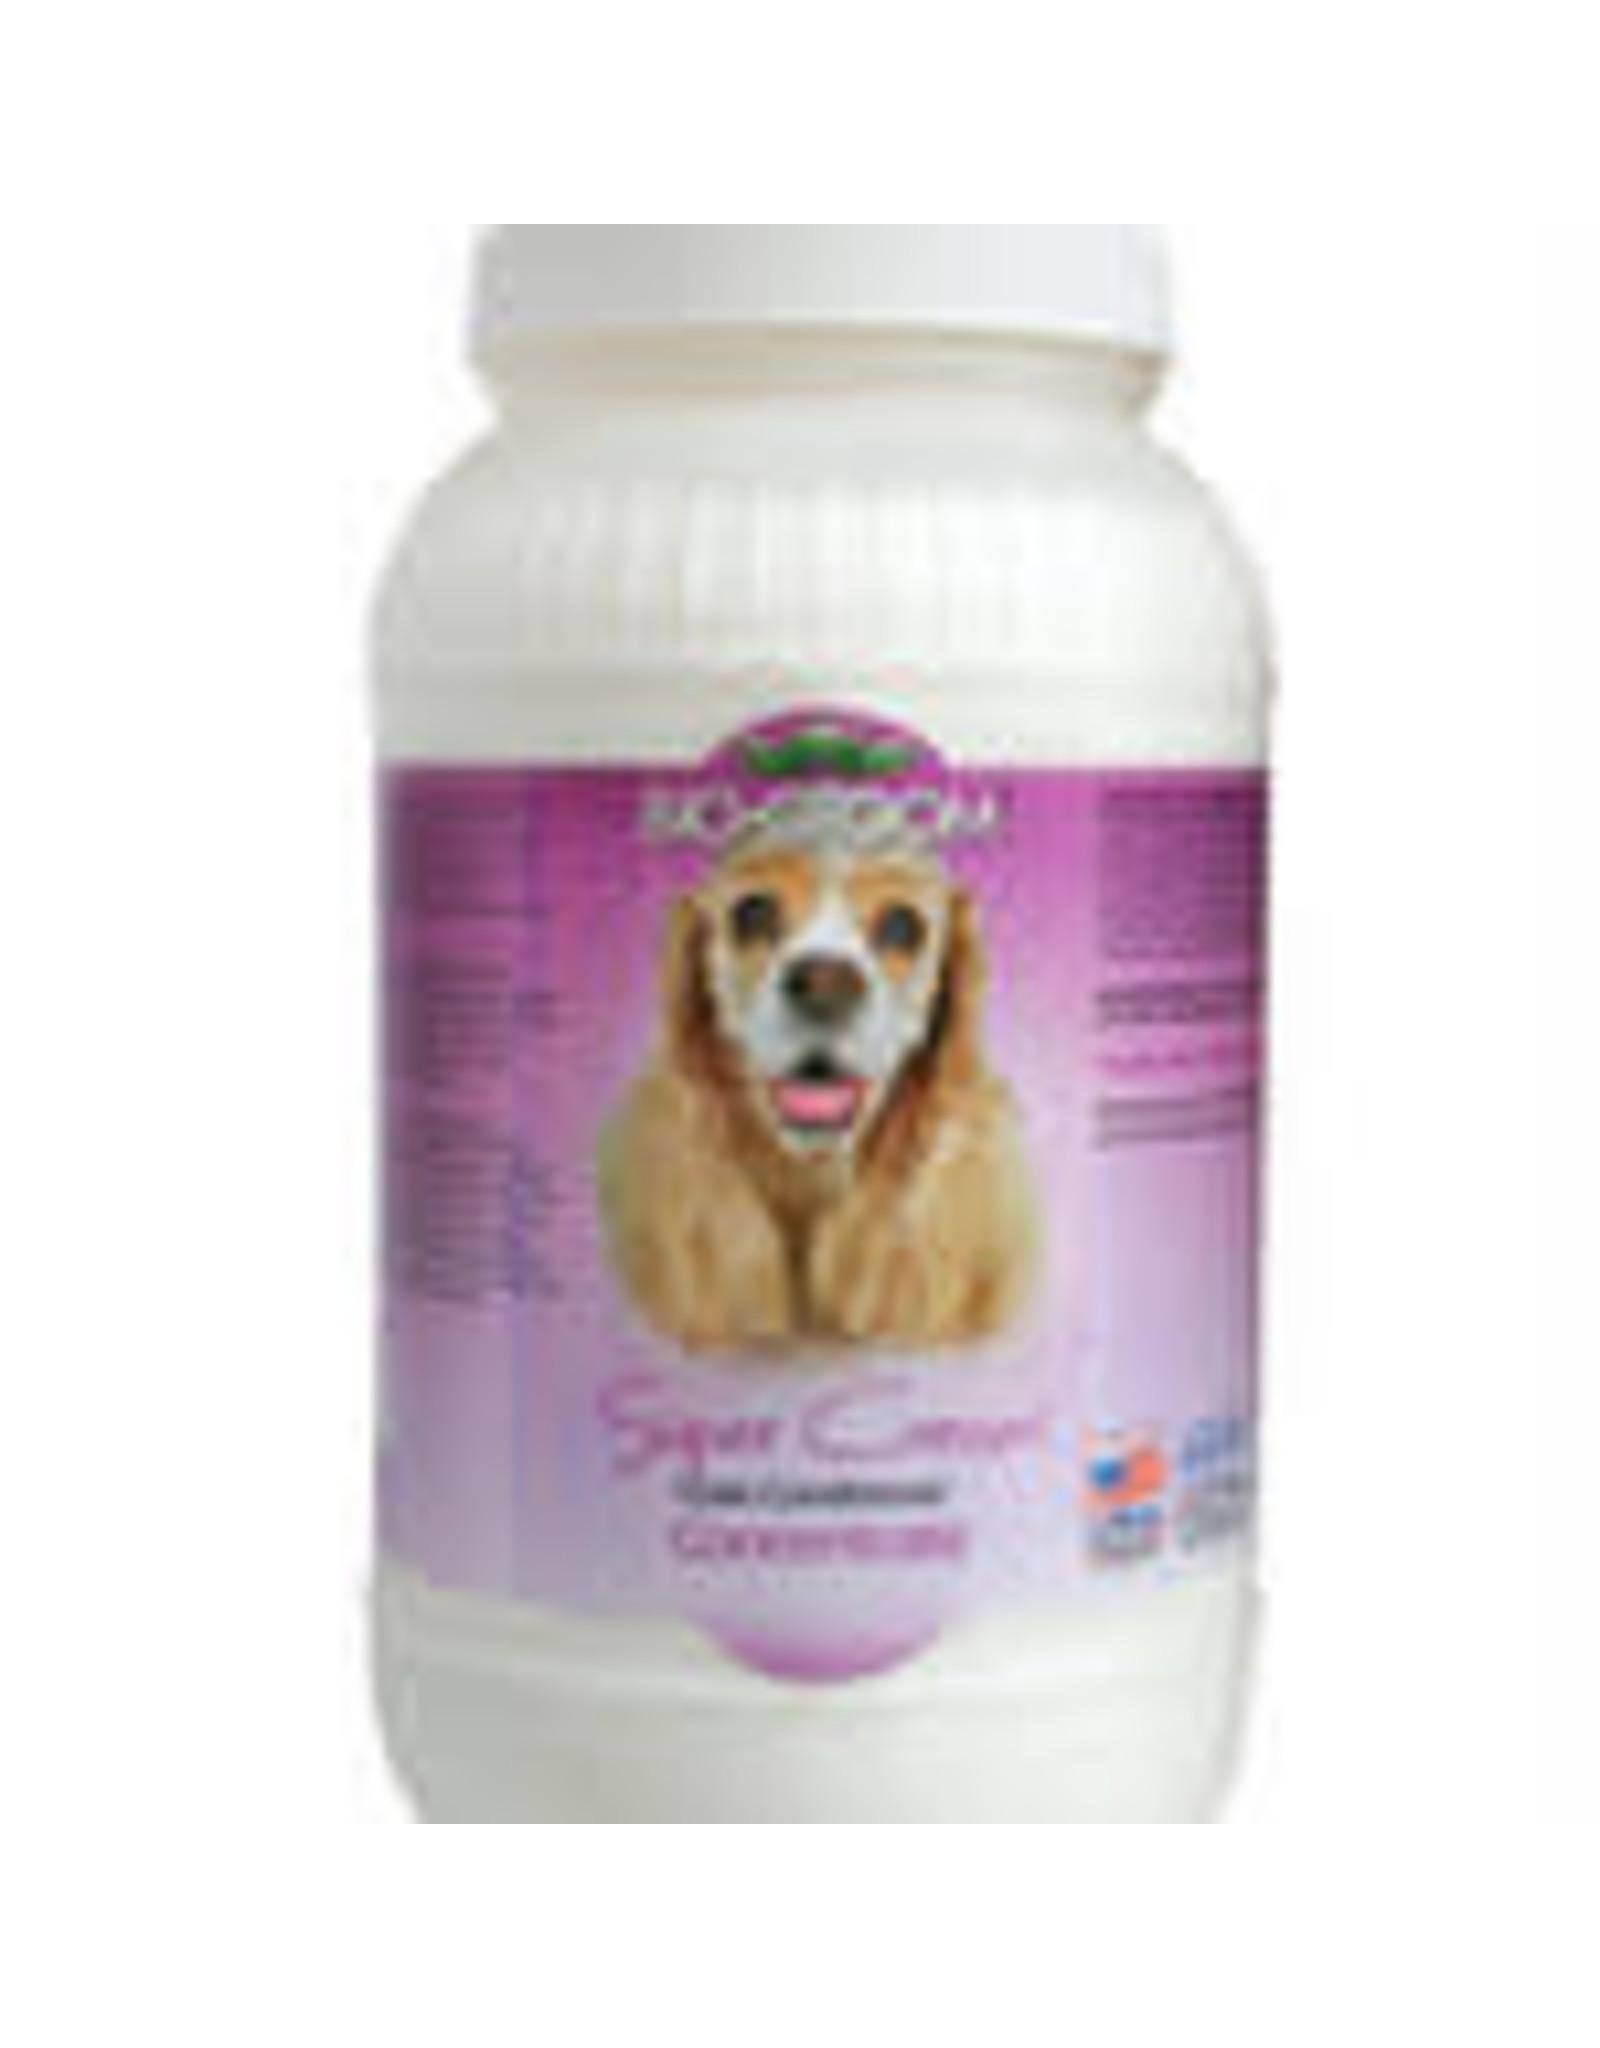 Biogroom BIOGROOM Super Cream Cond 3.7lbs